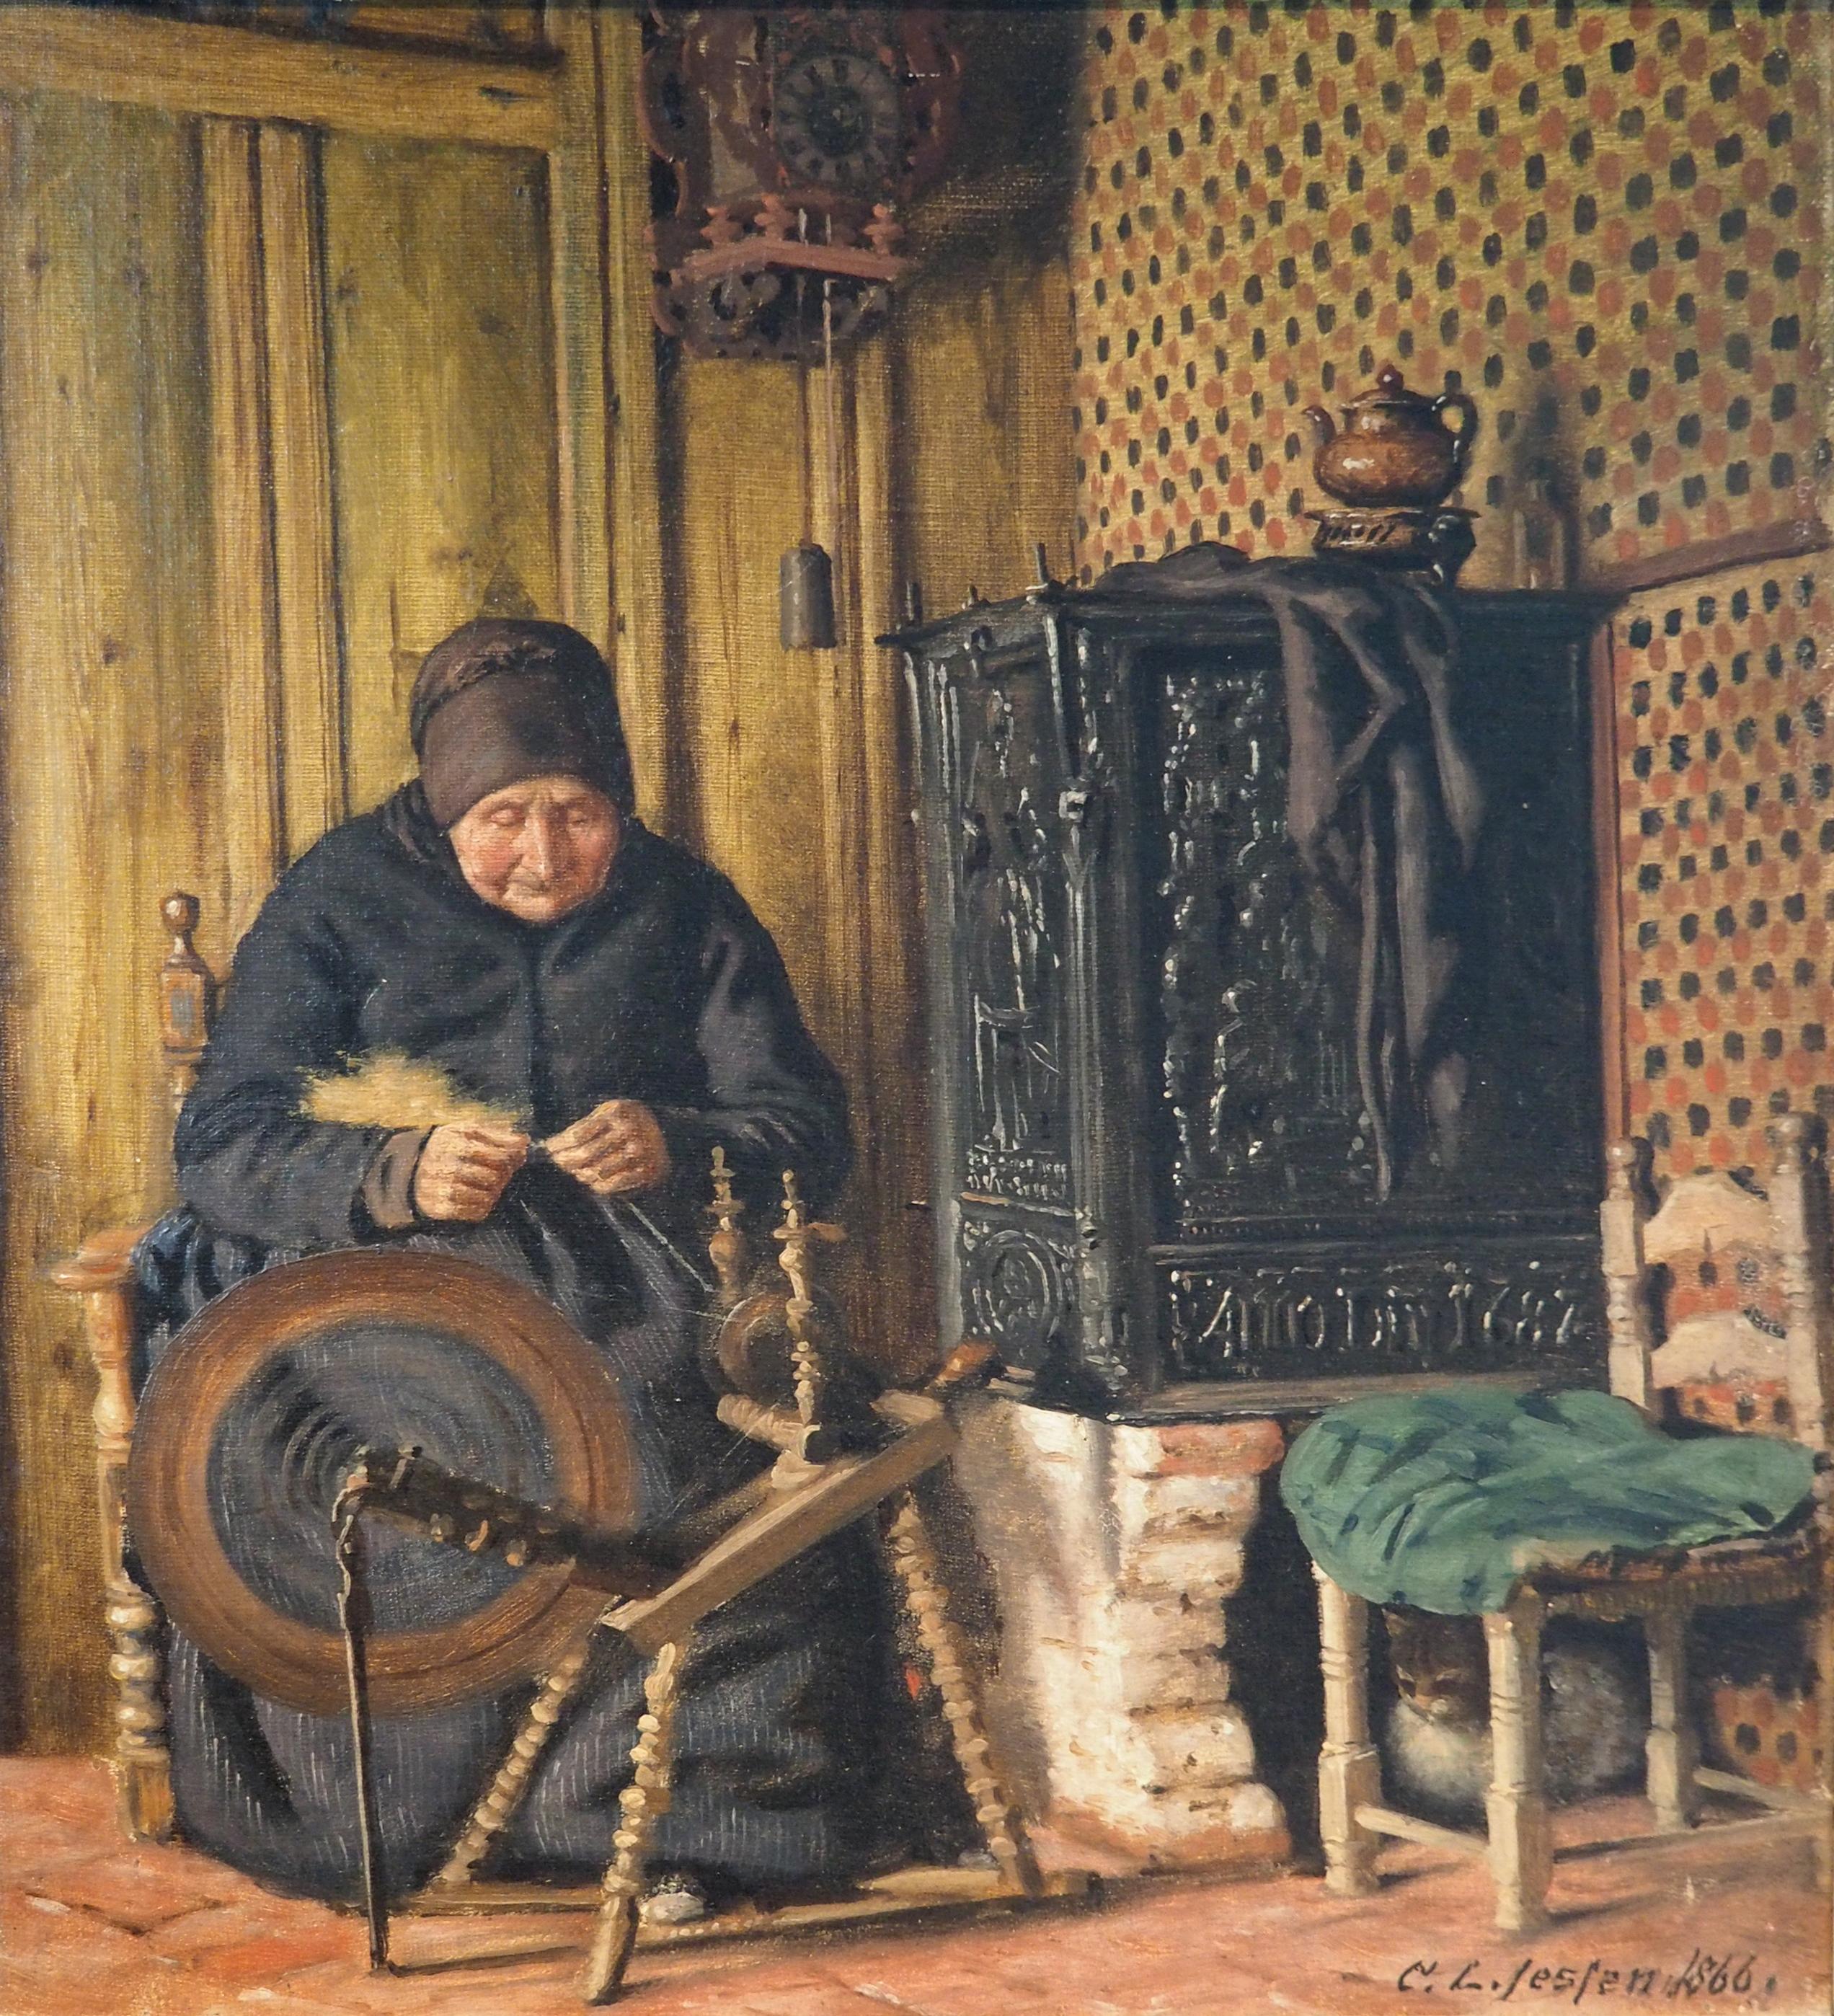 https://upload.wikimedia.org/wikipedia/commons/f/f4/Jessen_Carl_Ludwig_Alte_Frau_90_Spinnrad_Museumsberg_Flensburg_Heinrich-Sauermann-Haus.JPG